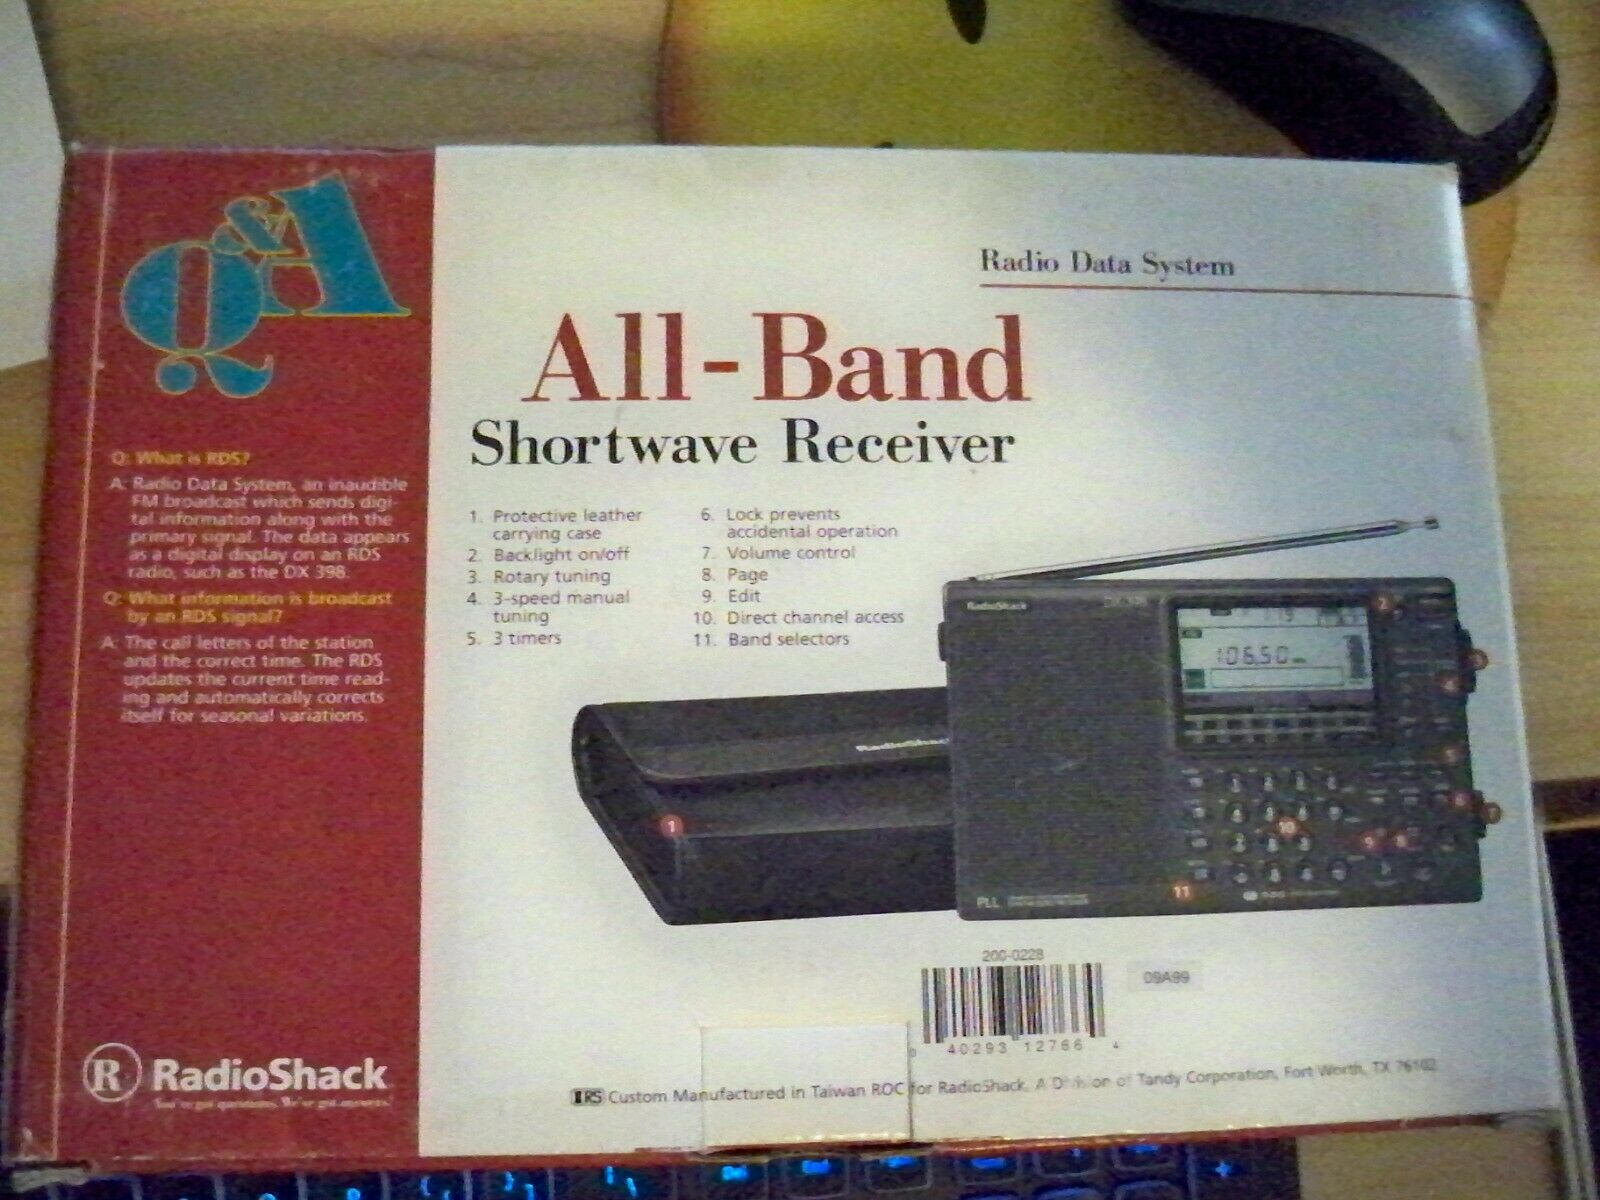 radio shack dx 398 all band shortwave